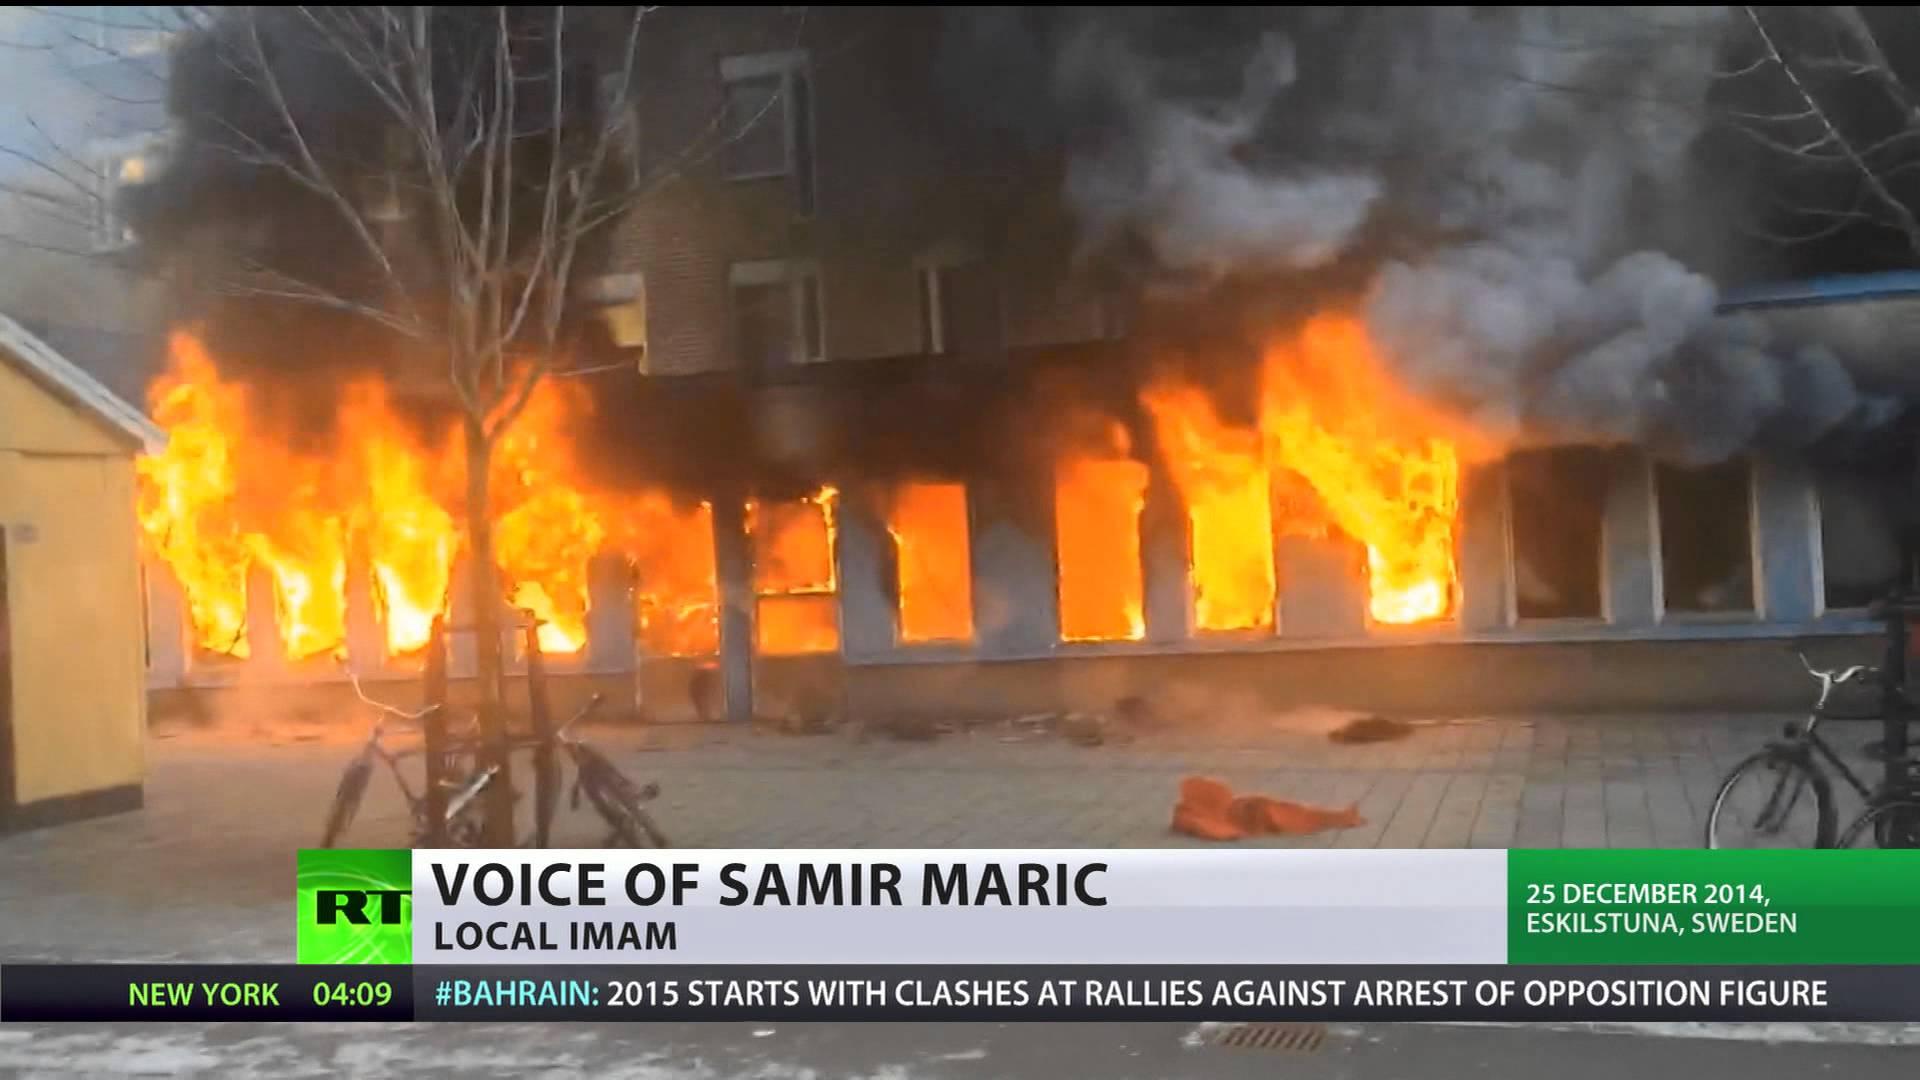 Fire in sweden photo